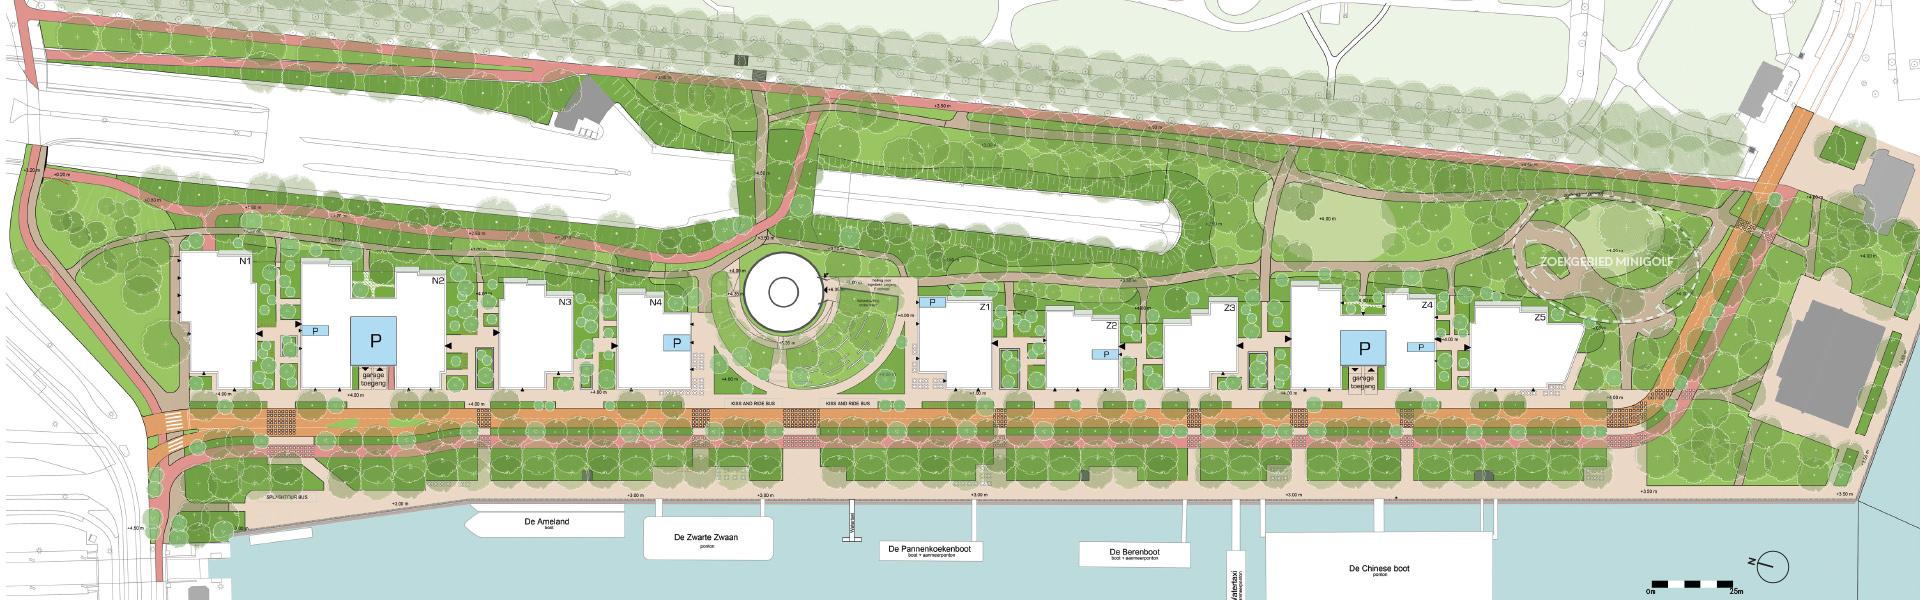 Masterplan ParkHaven010